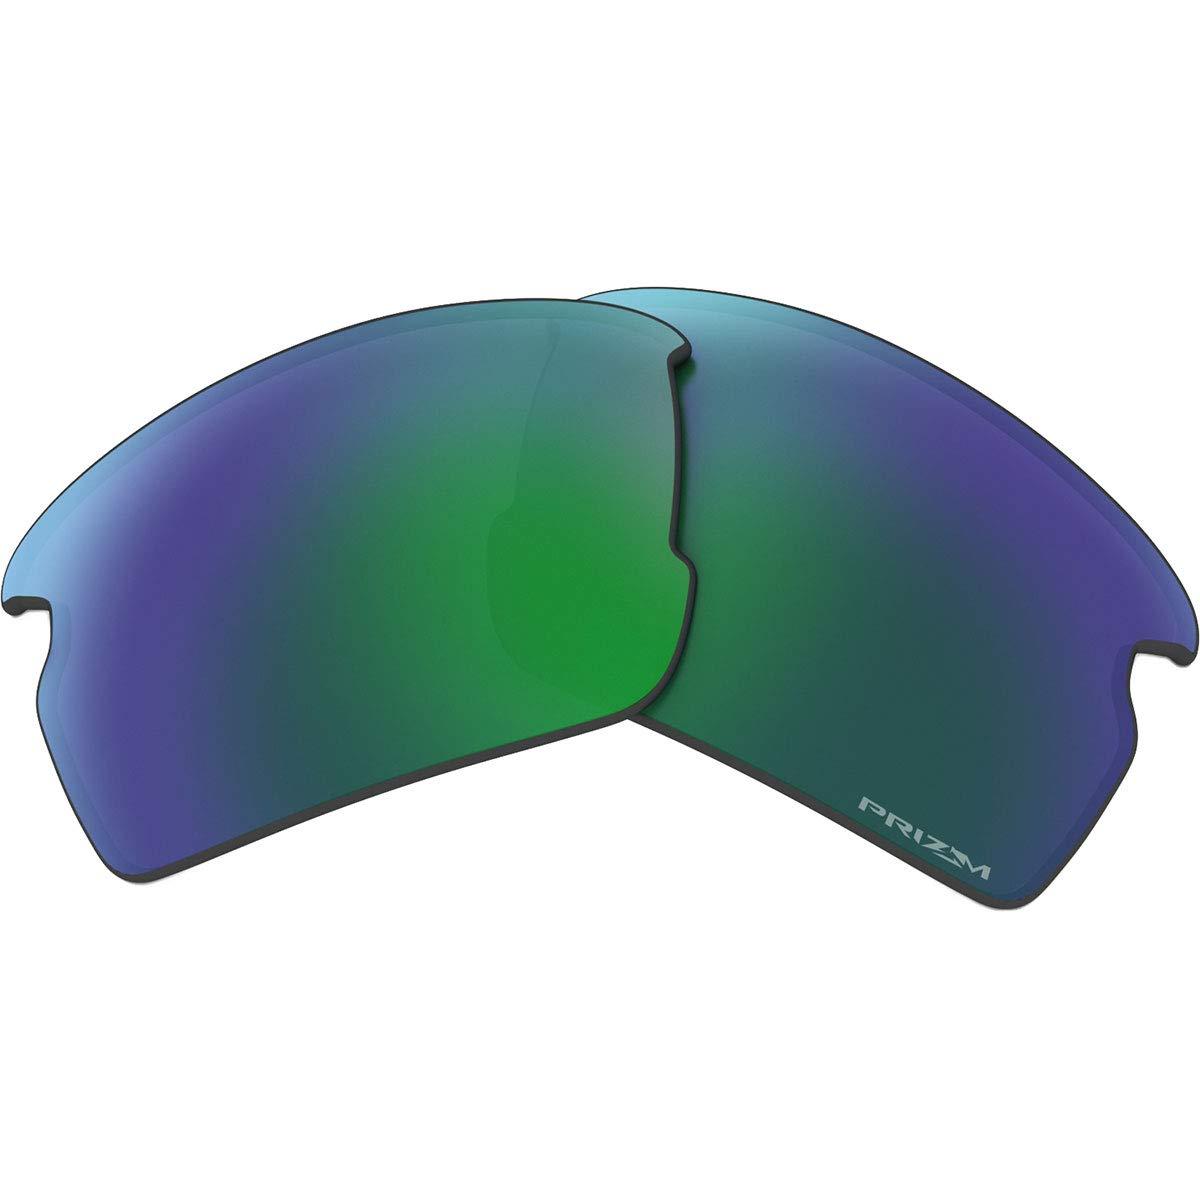 Oakley Flak 2.0 ALK Replacement Lens Sunglass Accessories,One Size,Prizm Jade Polarized by Oakley